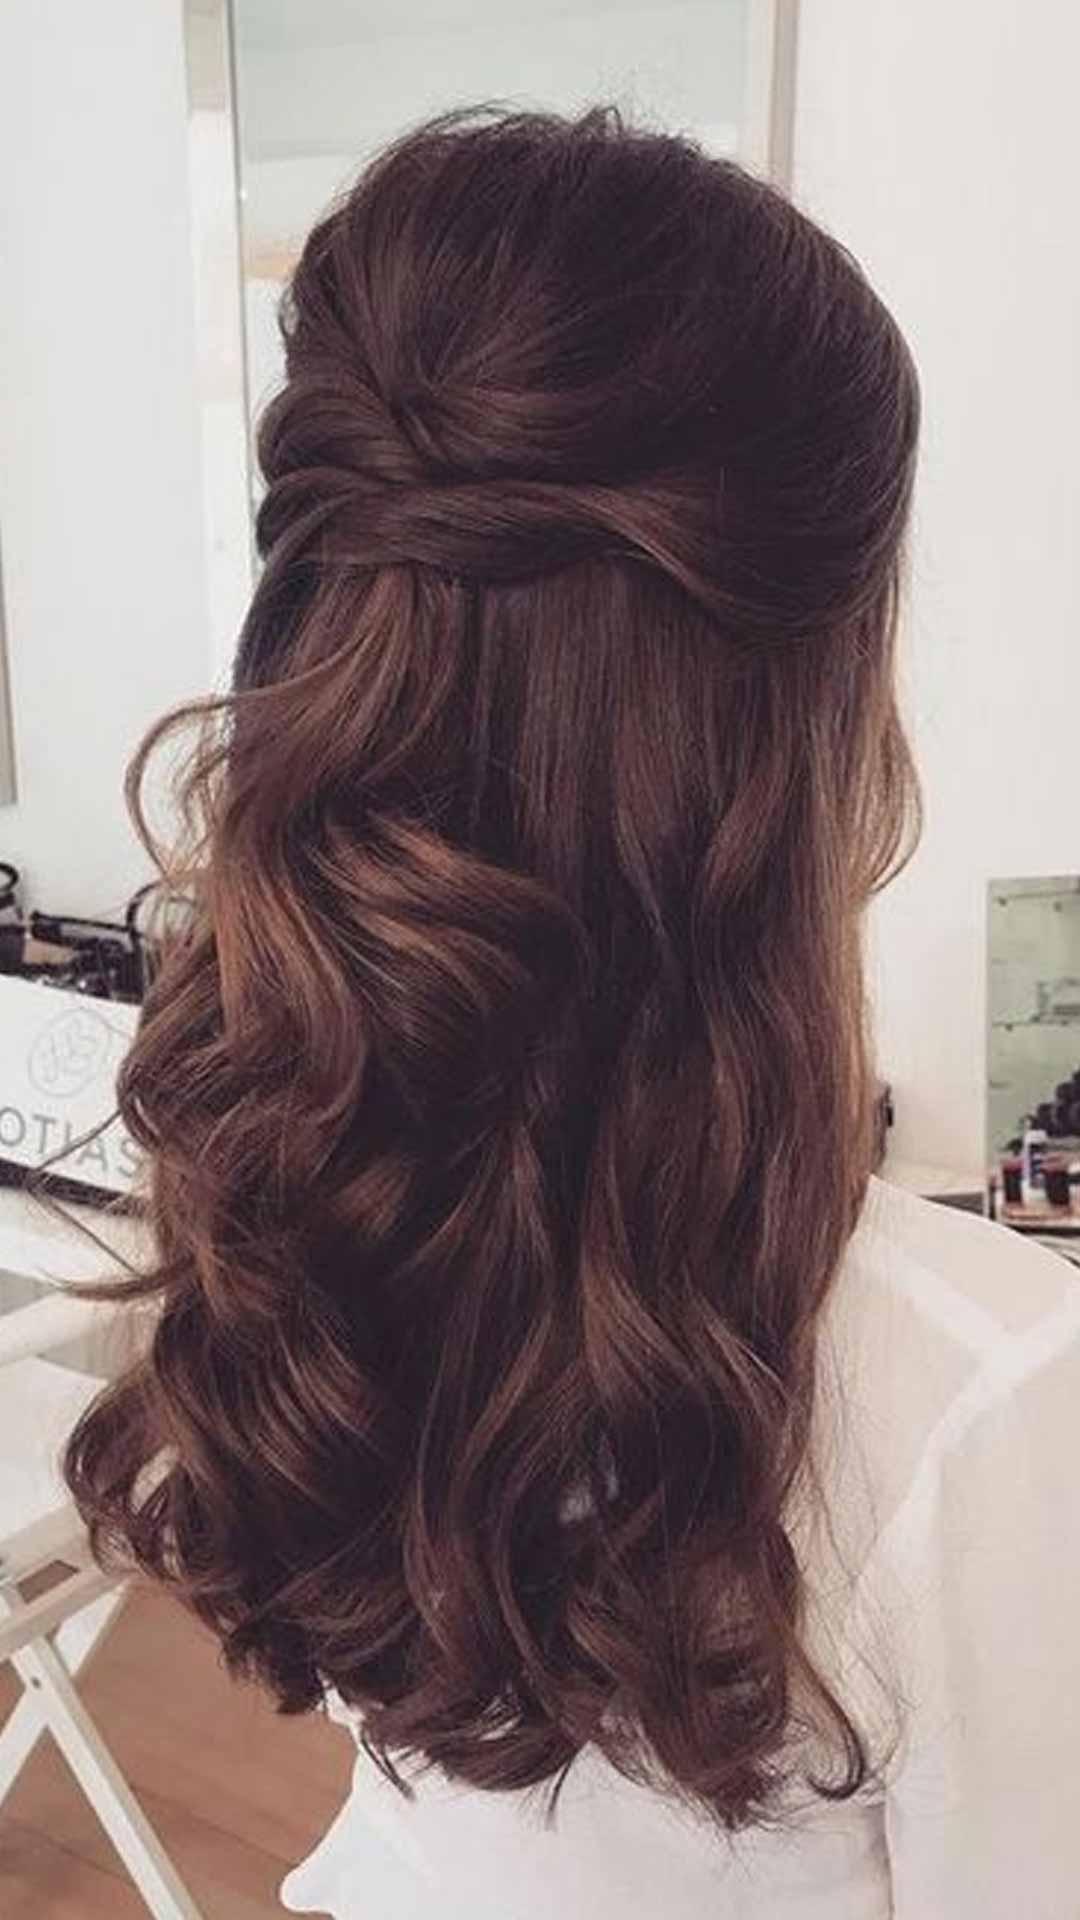 Half-tied hair